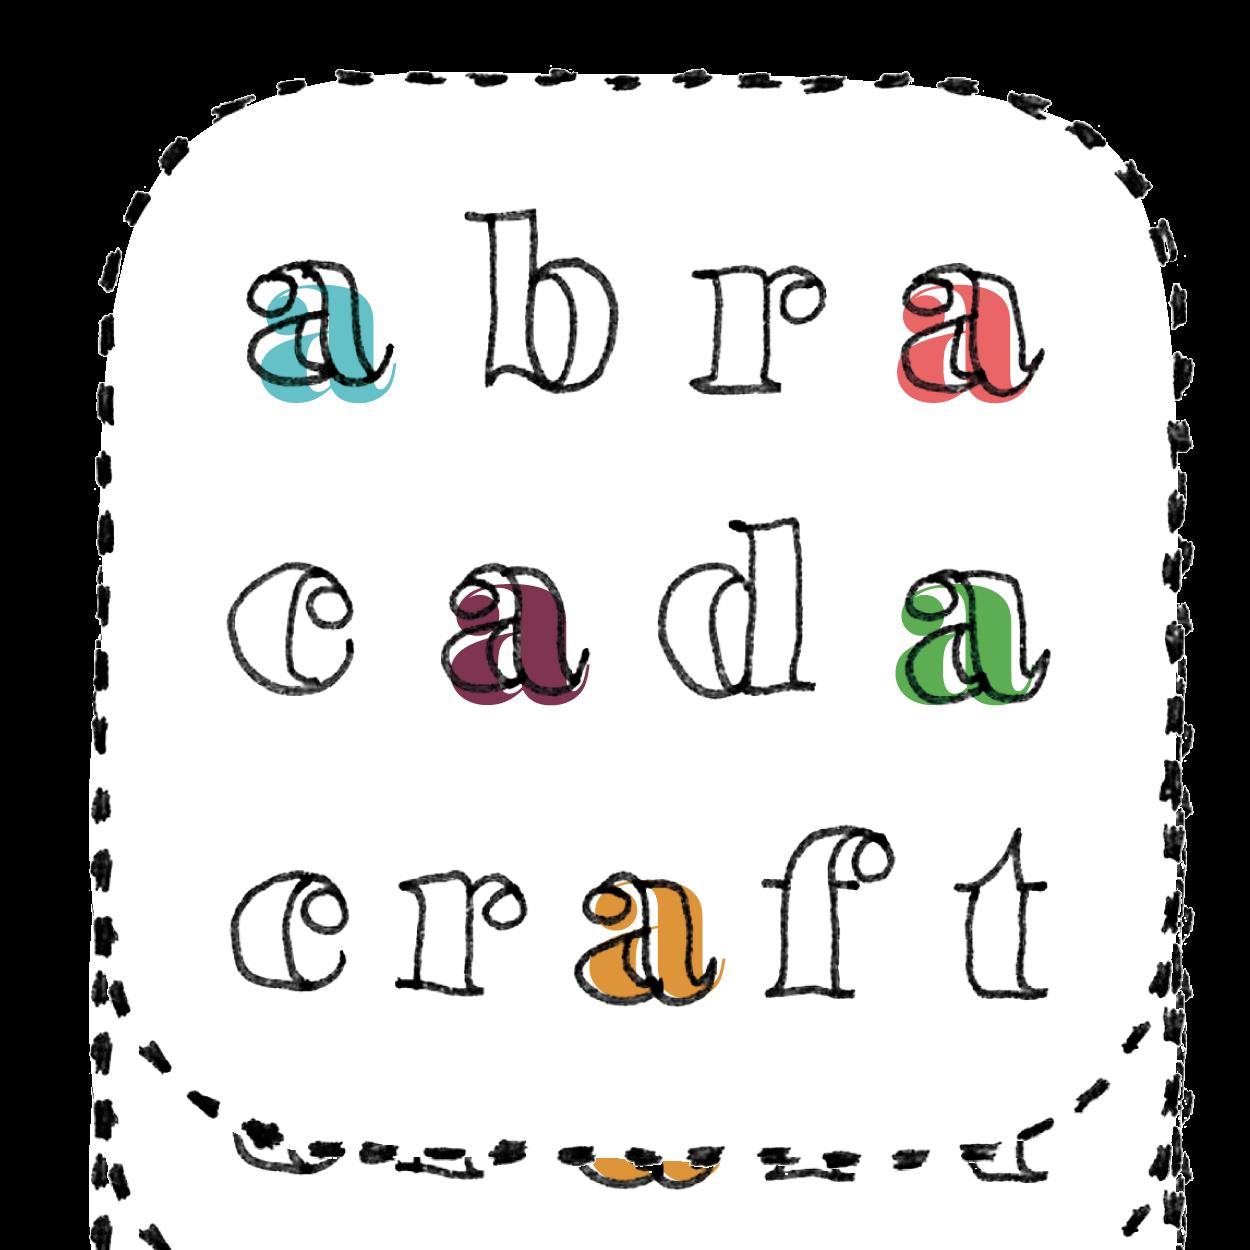 Abracdacraft